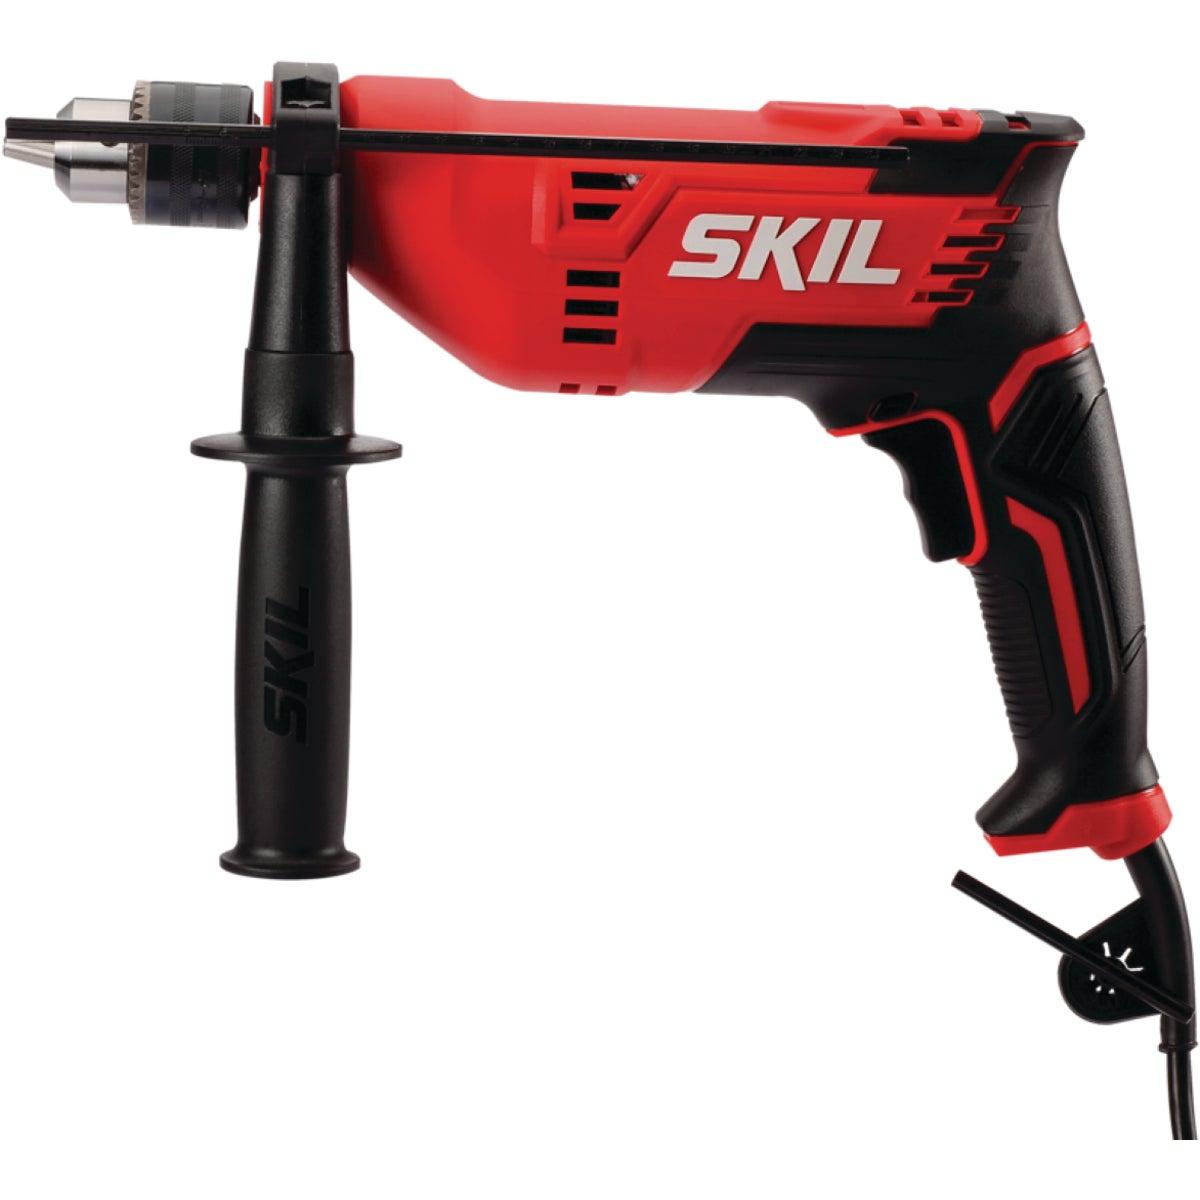 Skil Power Tools 1/2